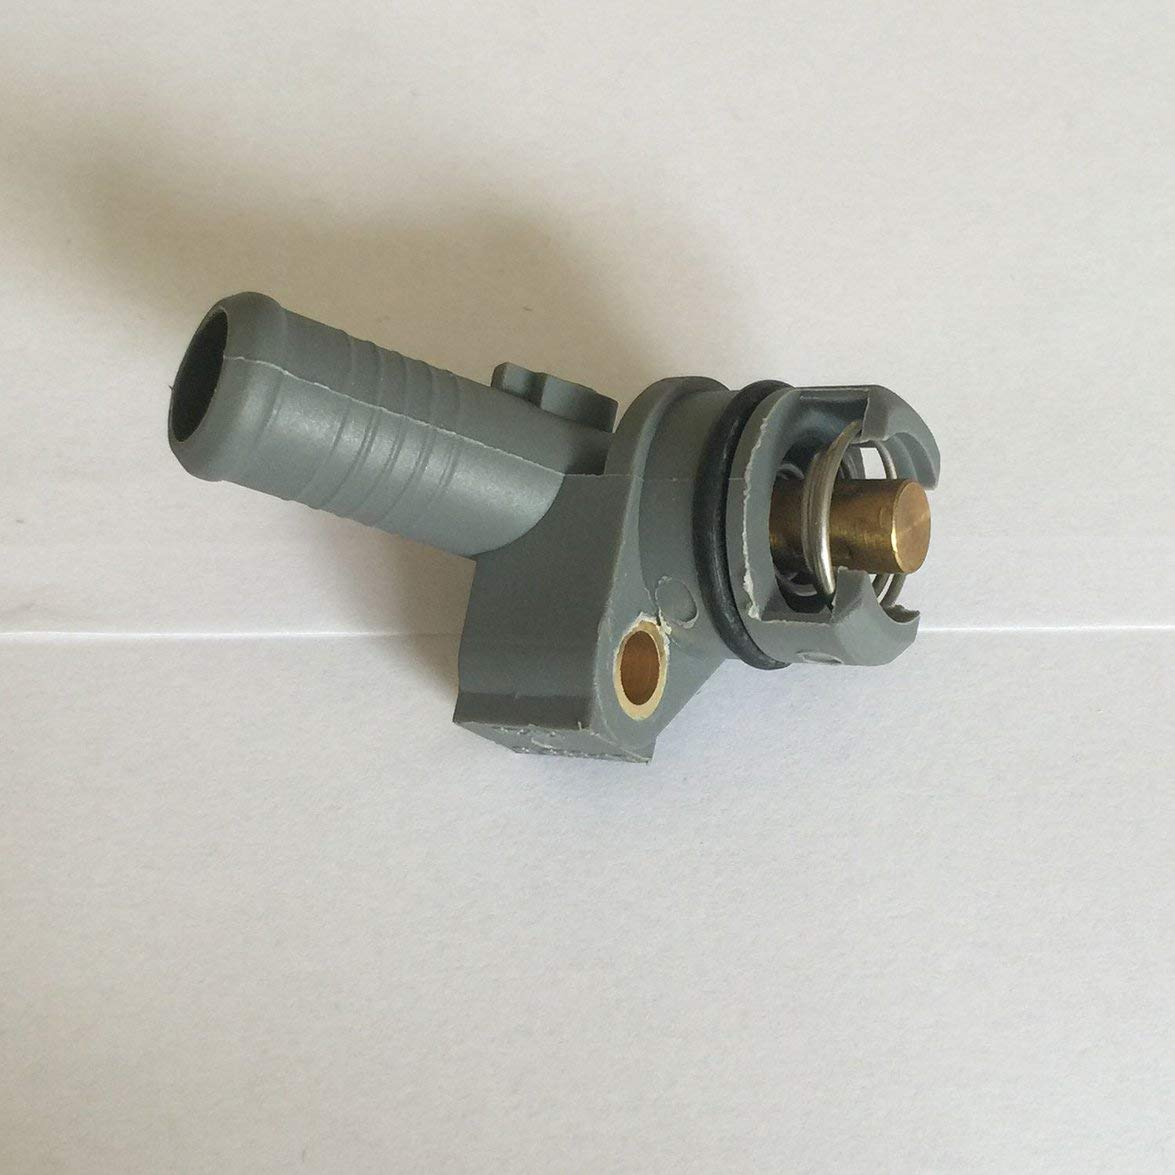 Kongqiabona para Ford Mondeo Mk3 2.0 2.2 Tdci Tddi Refrigerador Termostato Cubierta 6C1Q6L635-Ab Ob1 para Ford Mondeo Mk3 2.0 y 2.2 Tddi//Tdci 16V